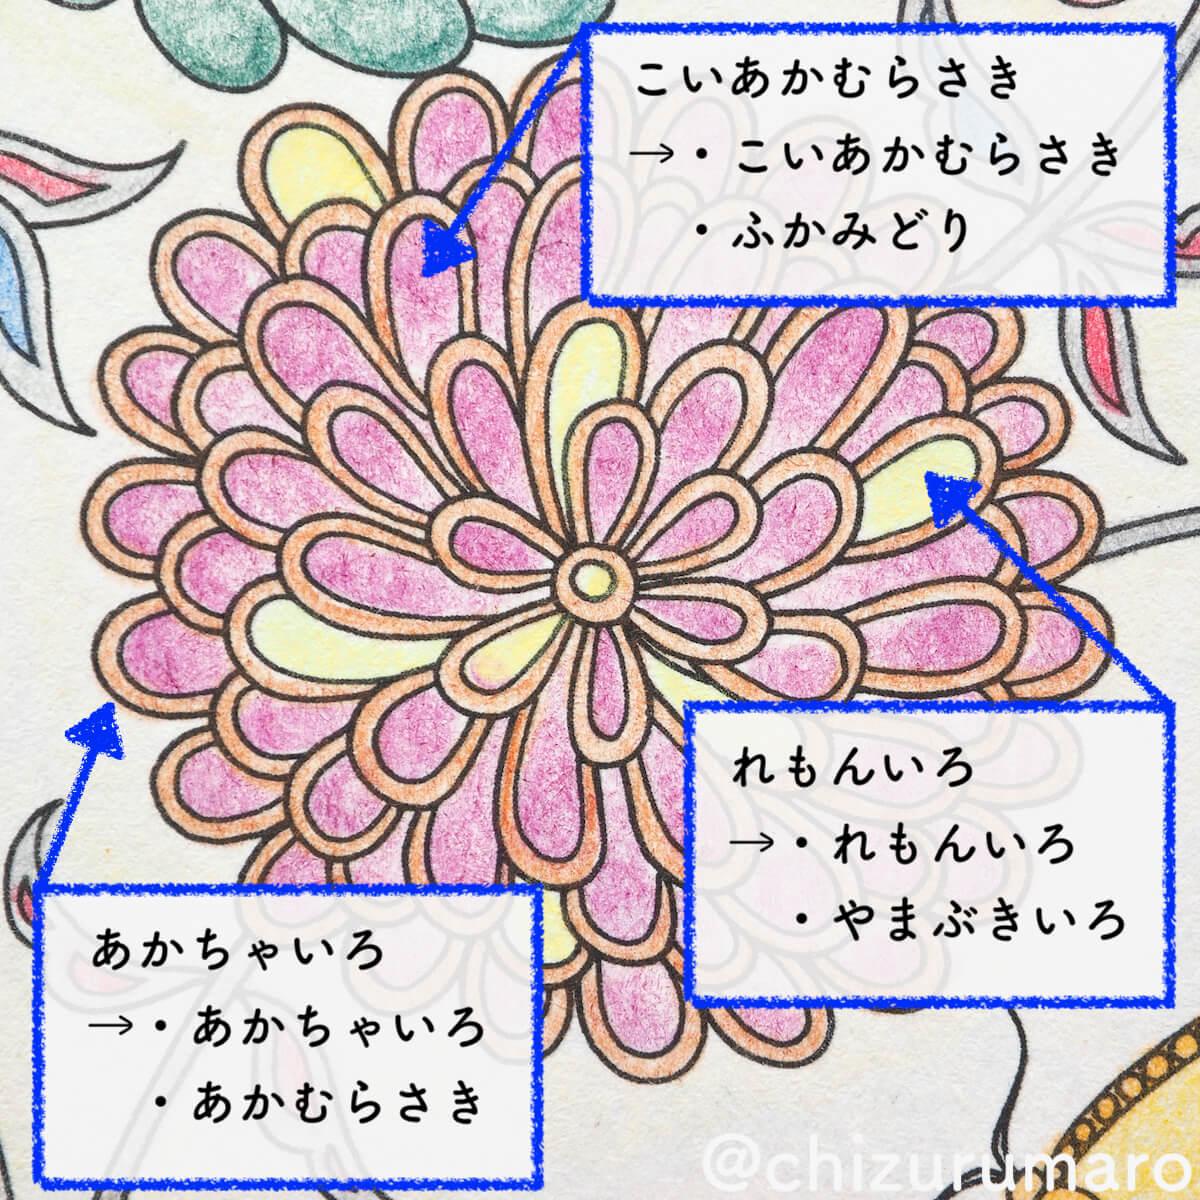 f:id:chizurumaro:20200422152337j:plain